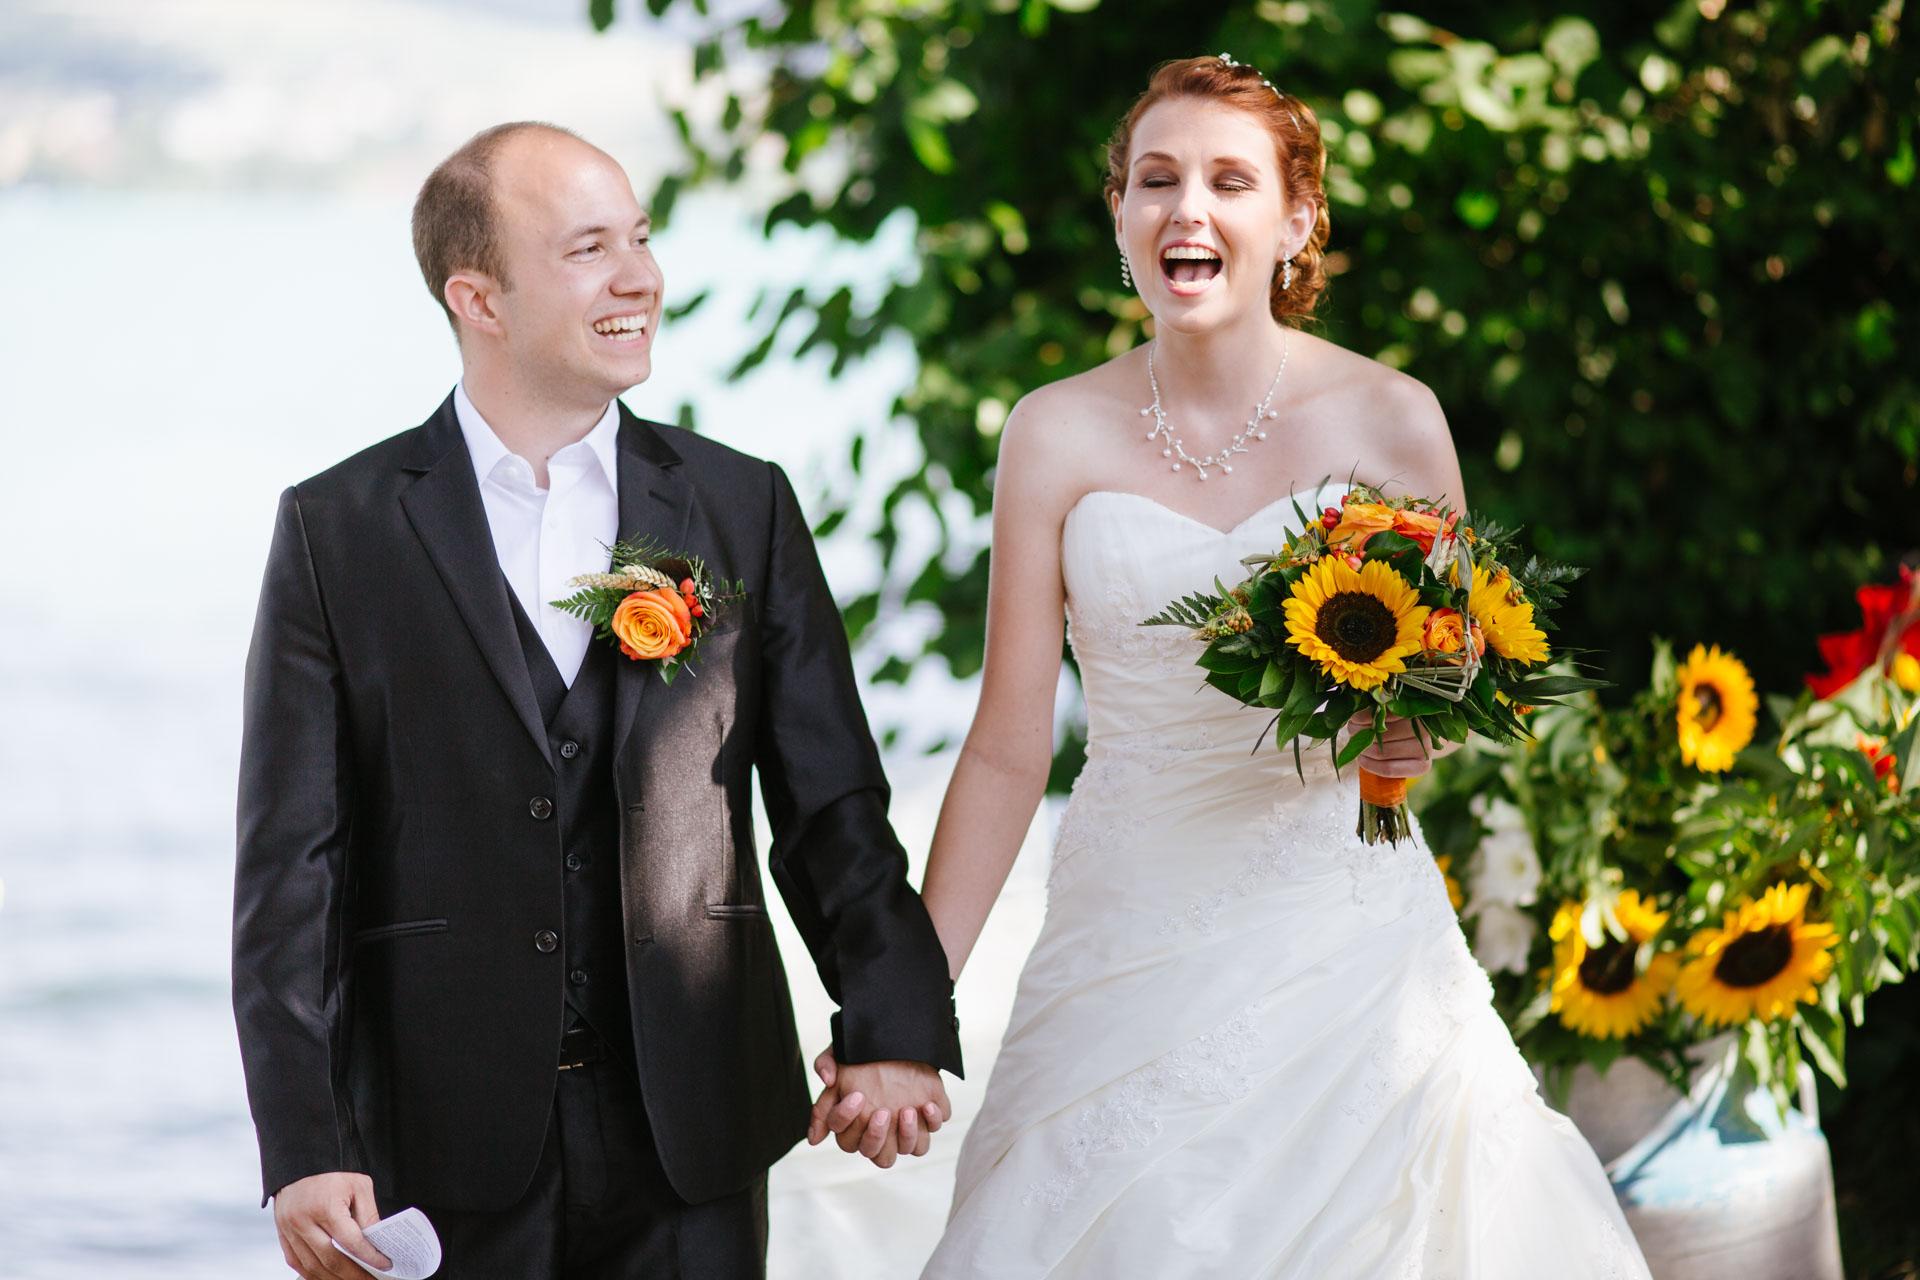 Pixelart_Hochzeitsfotografen_Loerrach_Rheinfelden_Hallwil_Schweiz_Linda-Ramon-1028